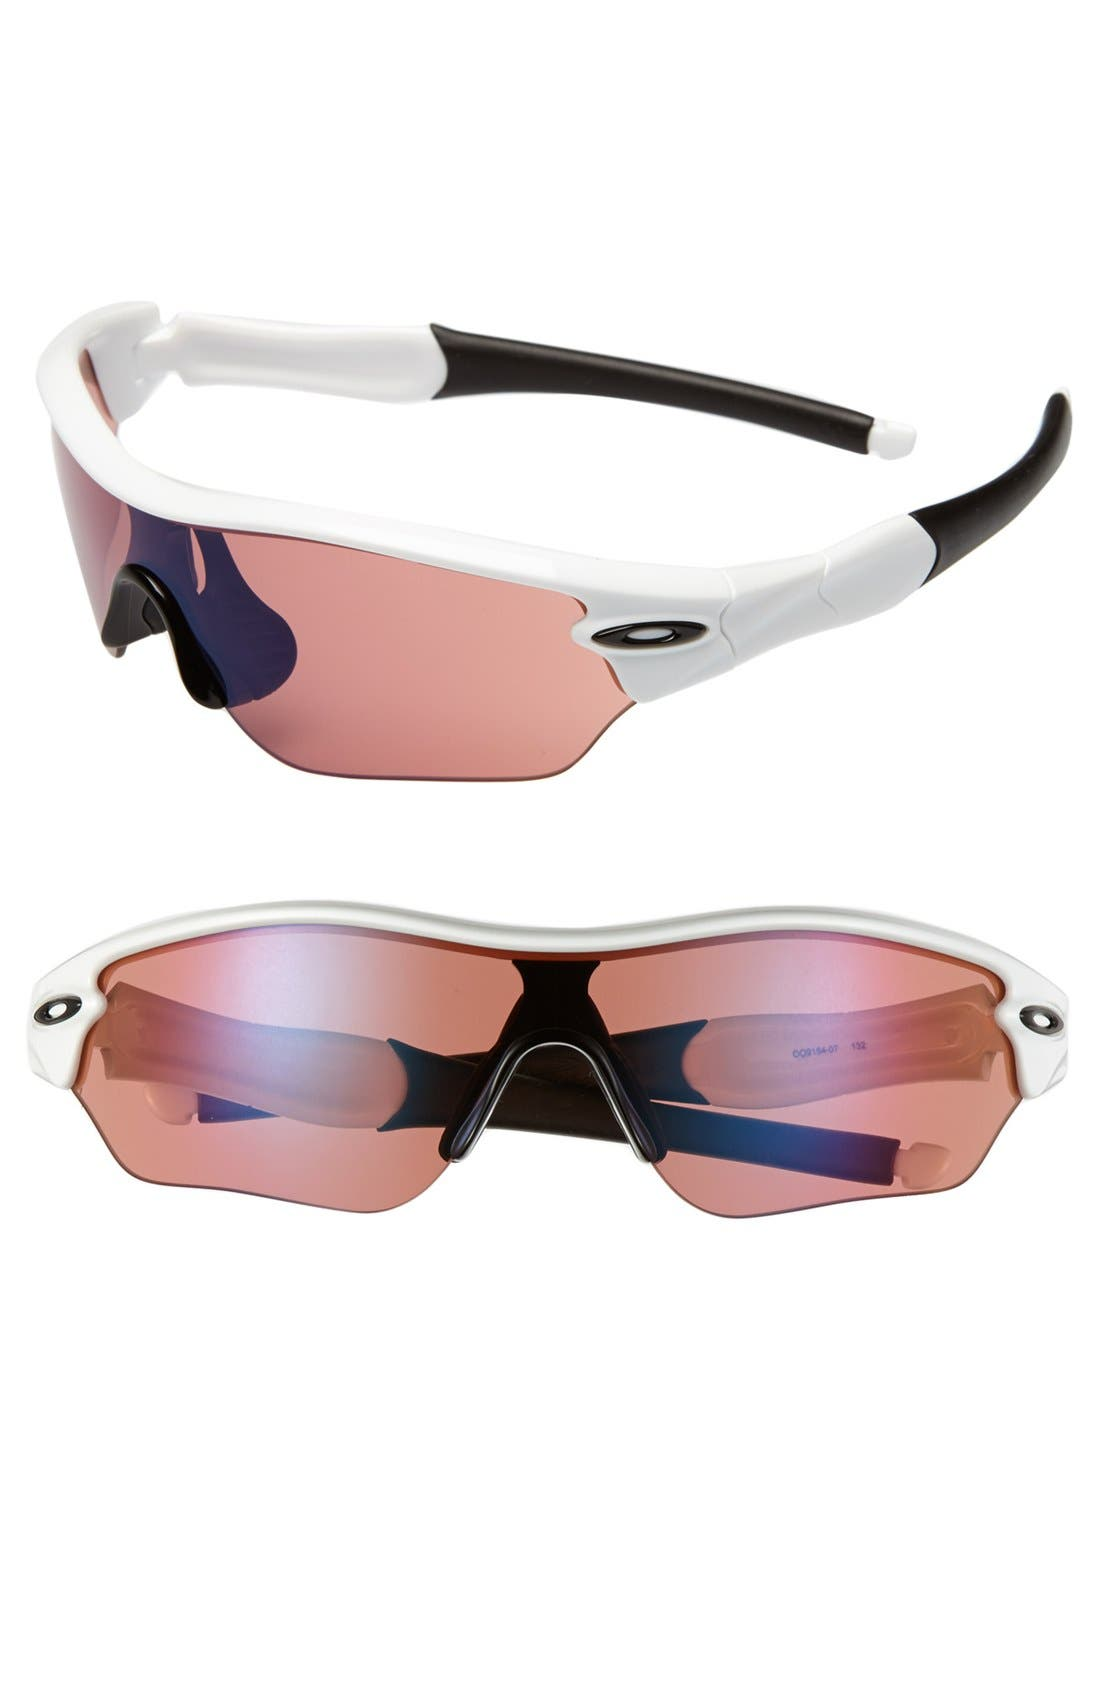 Alternate Image 1 Selected - Oakley 'Radar® Edge™' 135mm Sunglasses